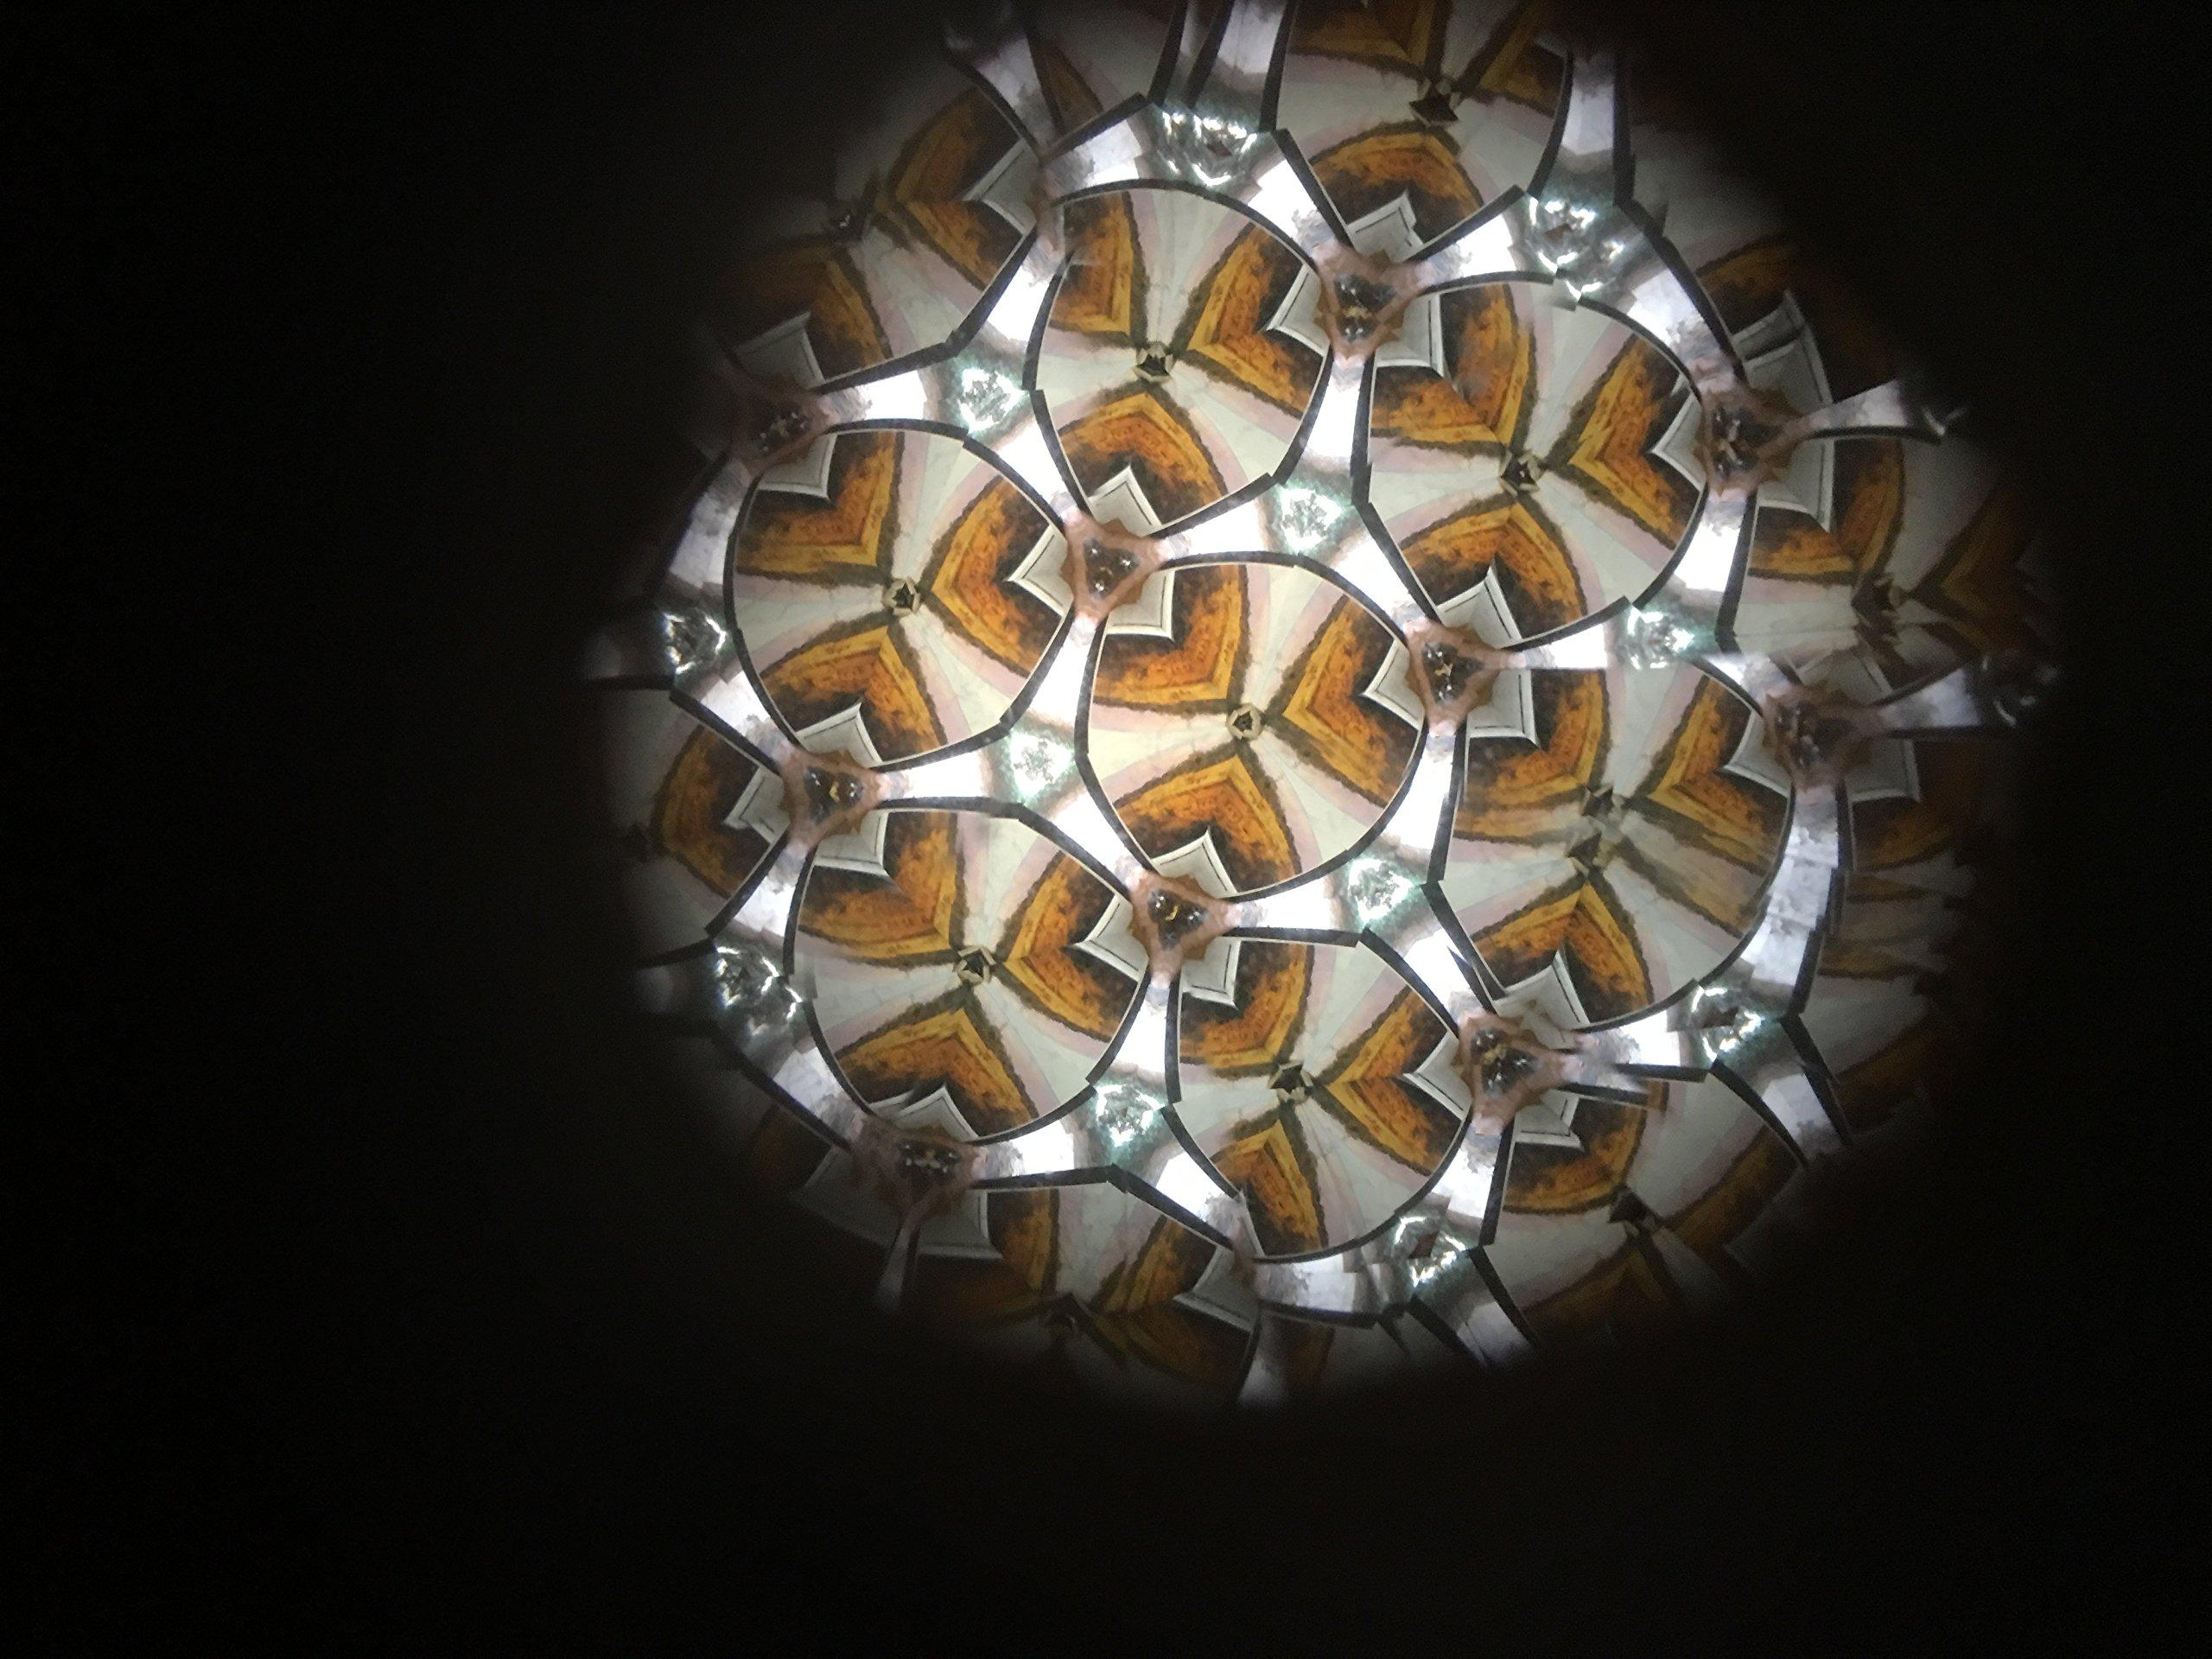 N & J Kaleidoscope Teleidoscope in Solid Padauk Wood, 5 1/2 Inch Barrel, Inlaid Padauk, Teak, Ebony and Jalneem by N & J (Image #6)